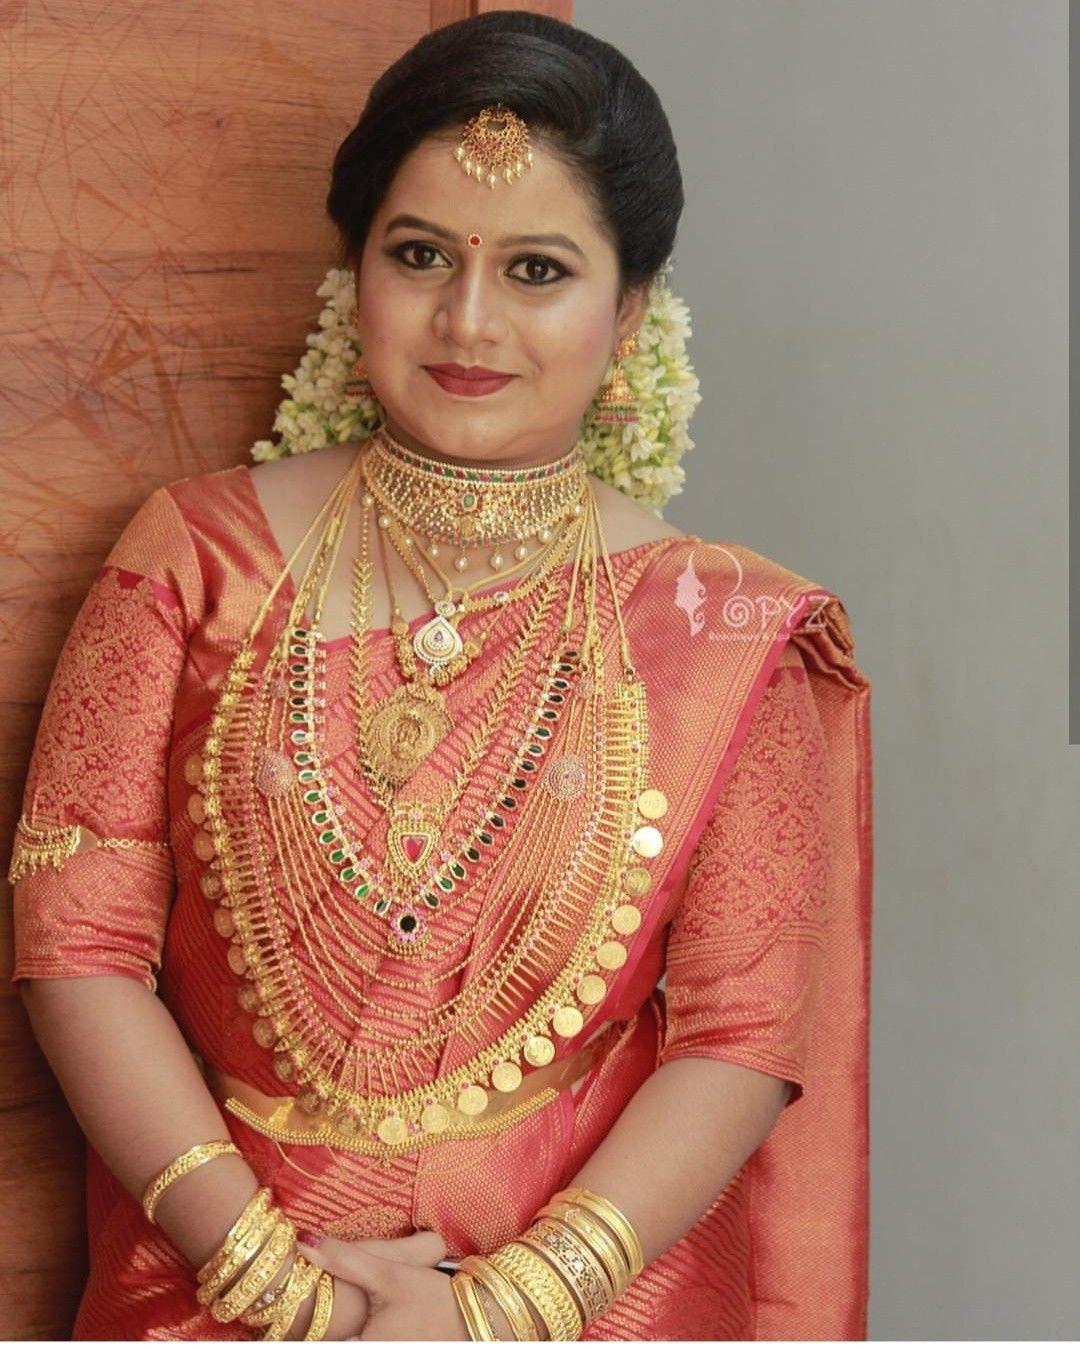 Pin By Arsha Arun On Meti Ke Kushboo Bridal Jewellery Indian Kerala Wedding Saree Wedding Saree Collection